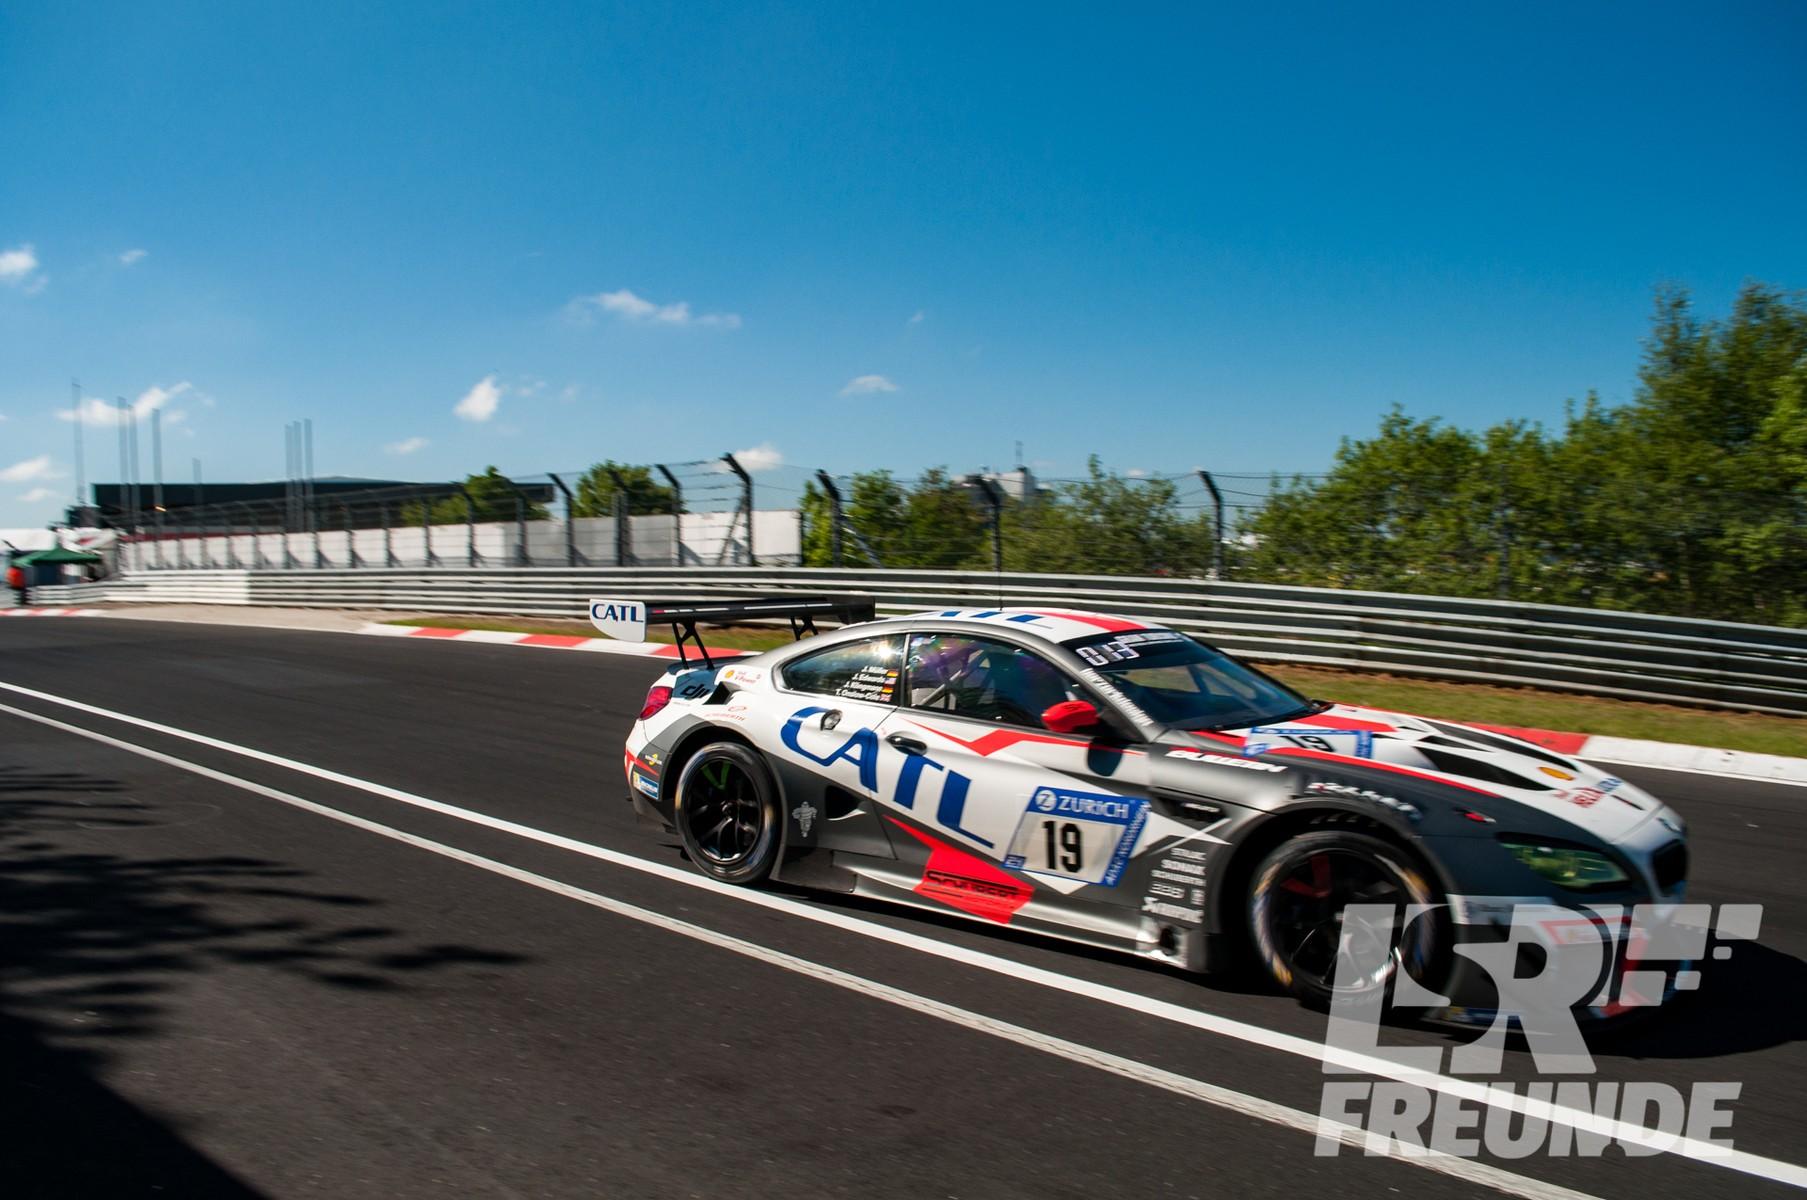 Schubert Motosport N24h 2017 BMW M6 GT3